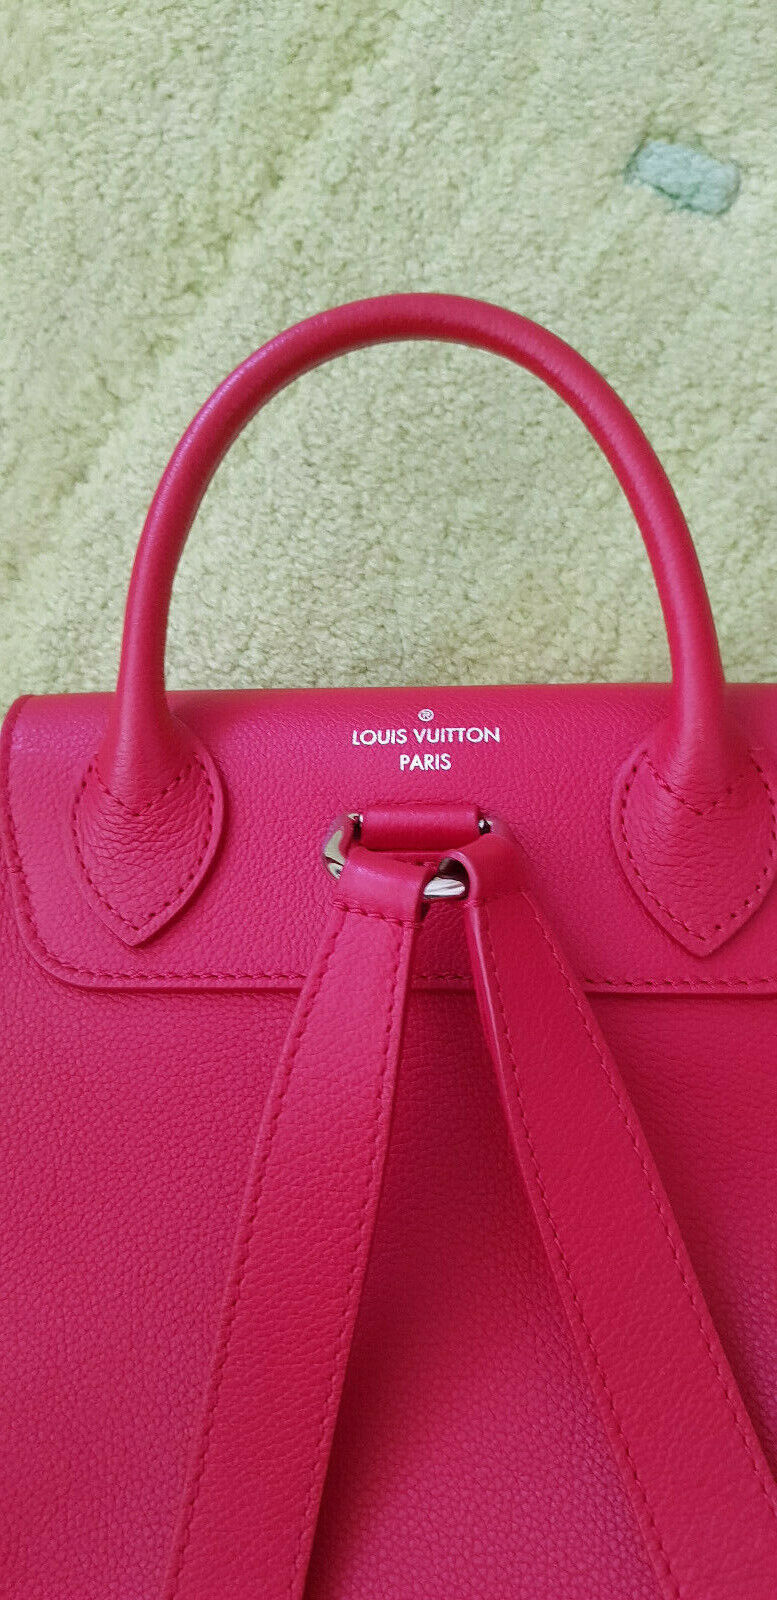 Louis Vuitton Lockme Backpack - image 2